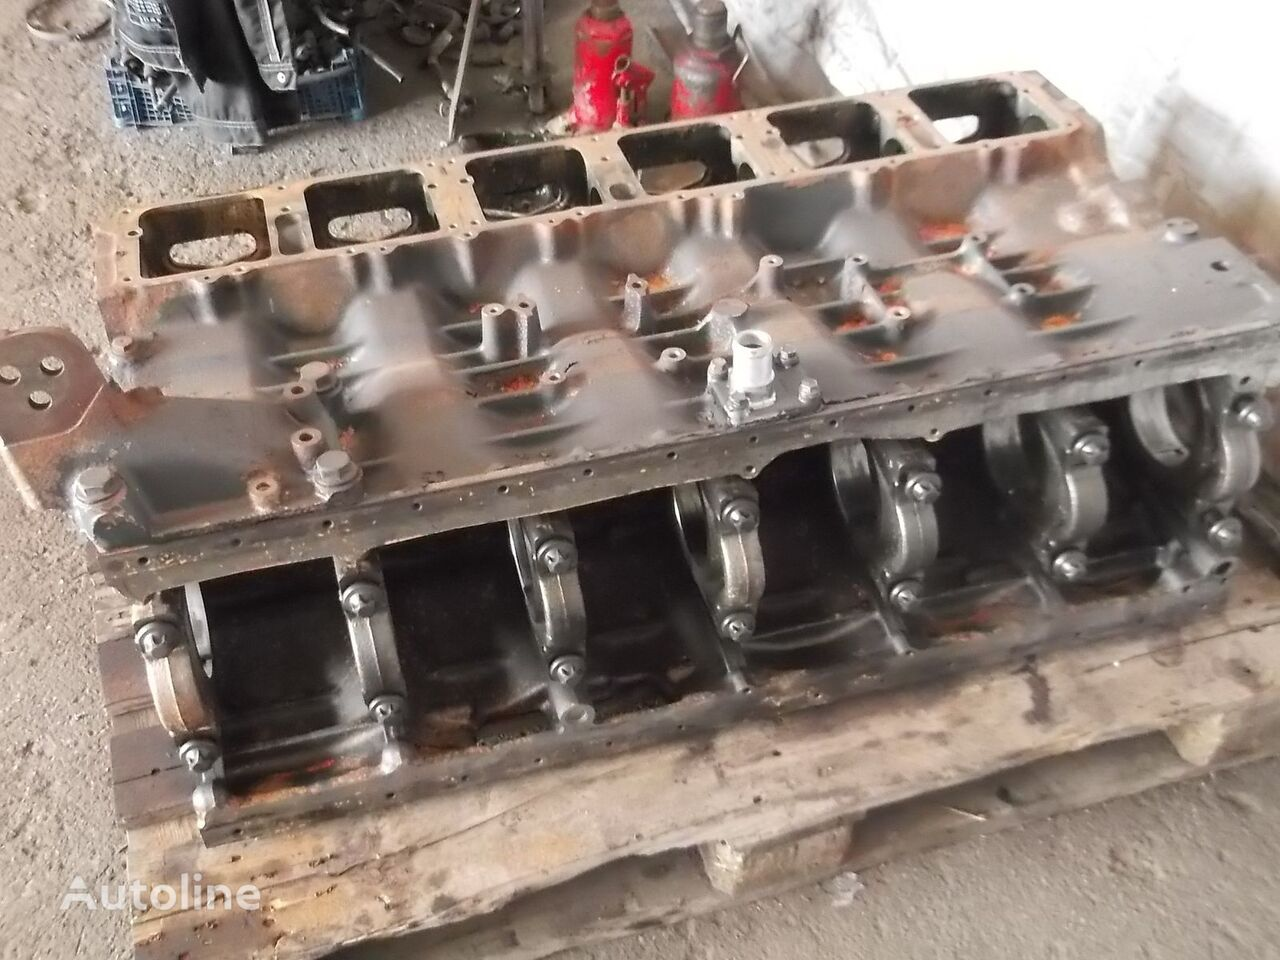 SCANIA T, P, G, R, L series EURO 3, EURO 4 HPI injection system, cylind blok cilindara za SCANIA R, P, G, L series tegljača